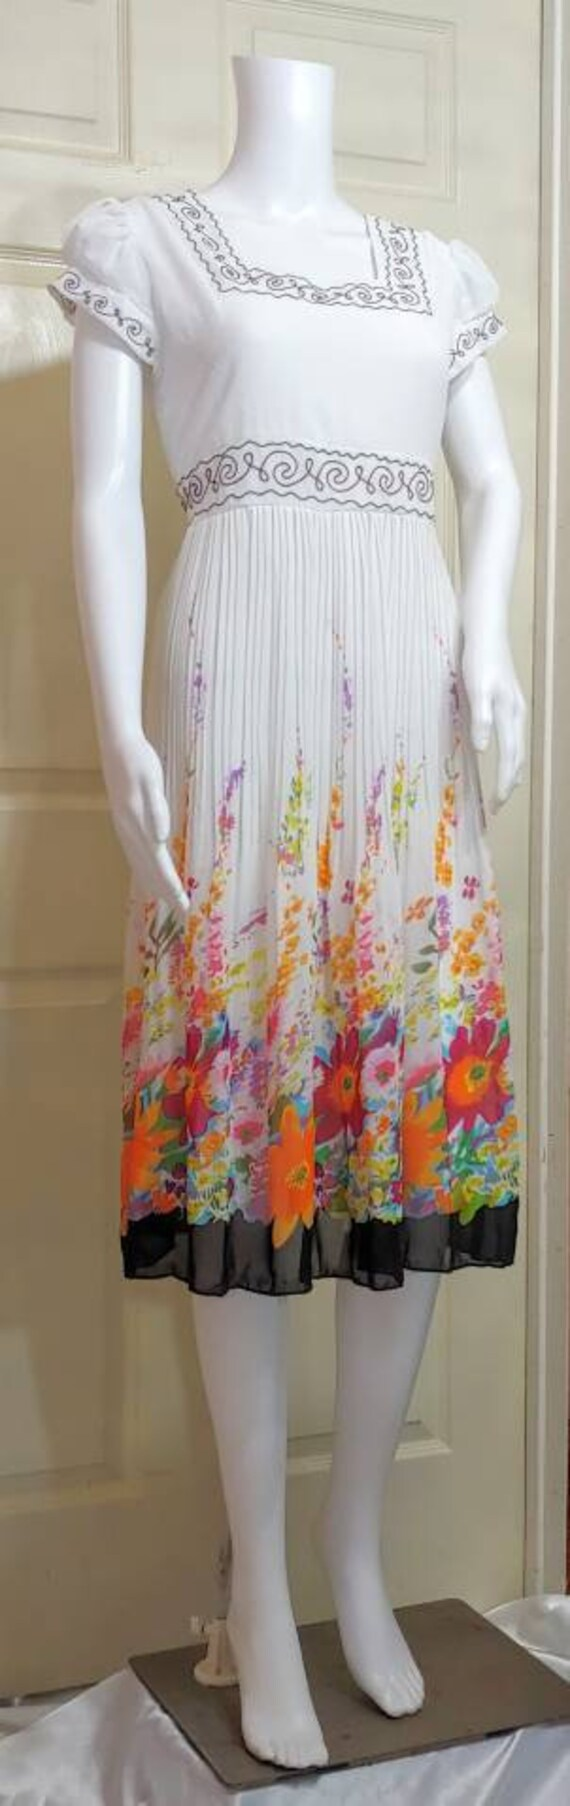 Yu Ling Dress